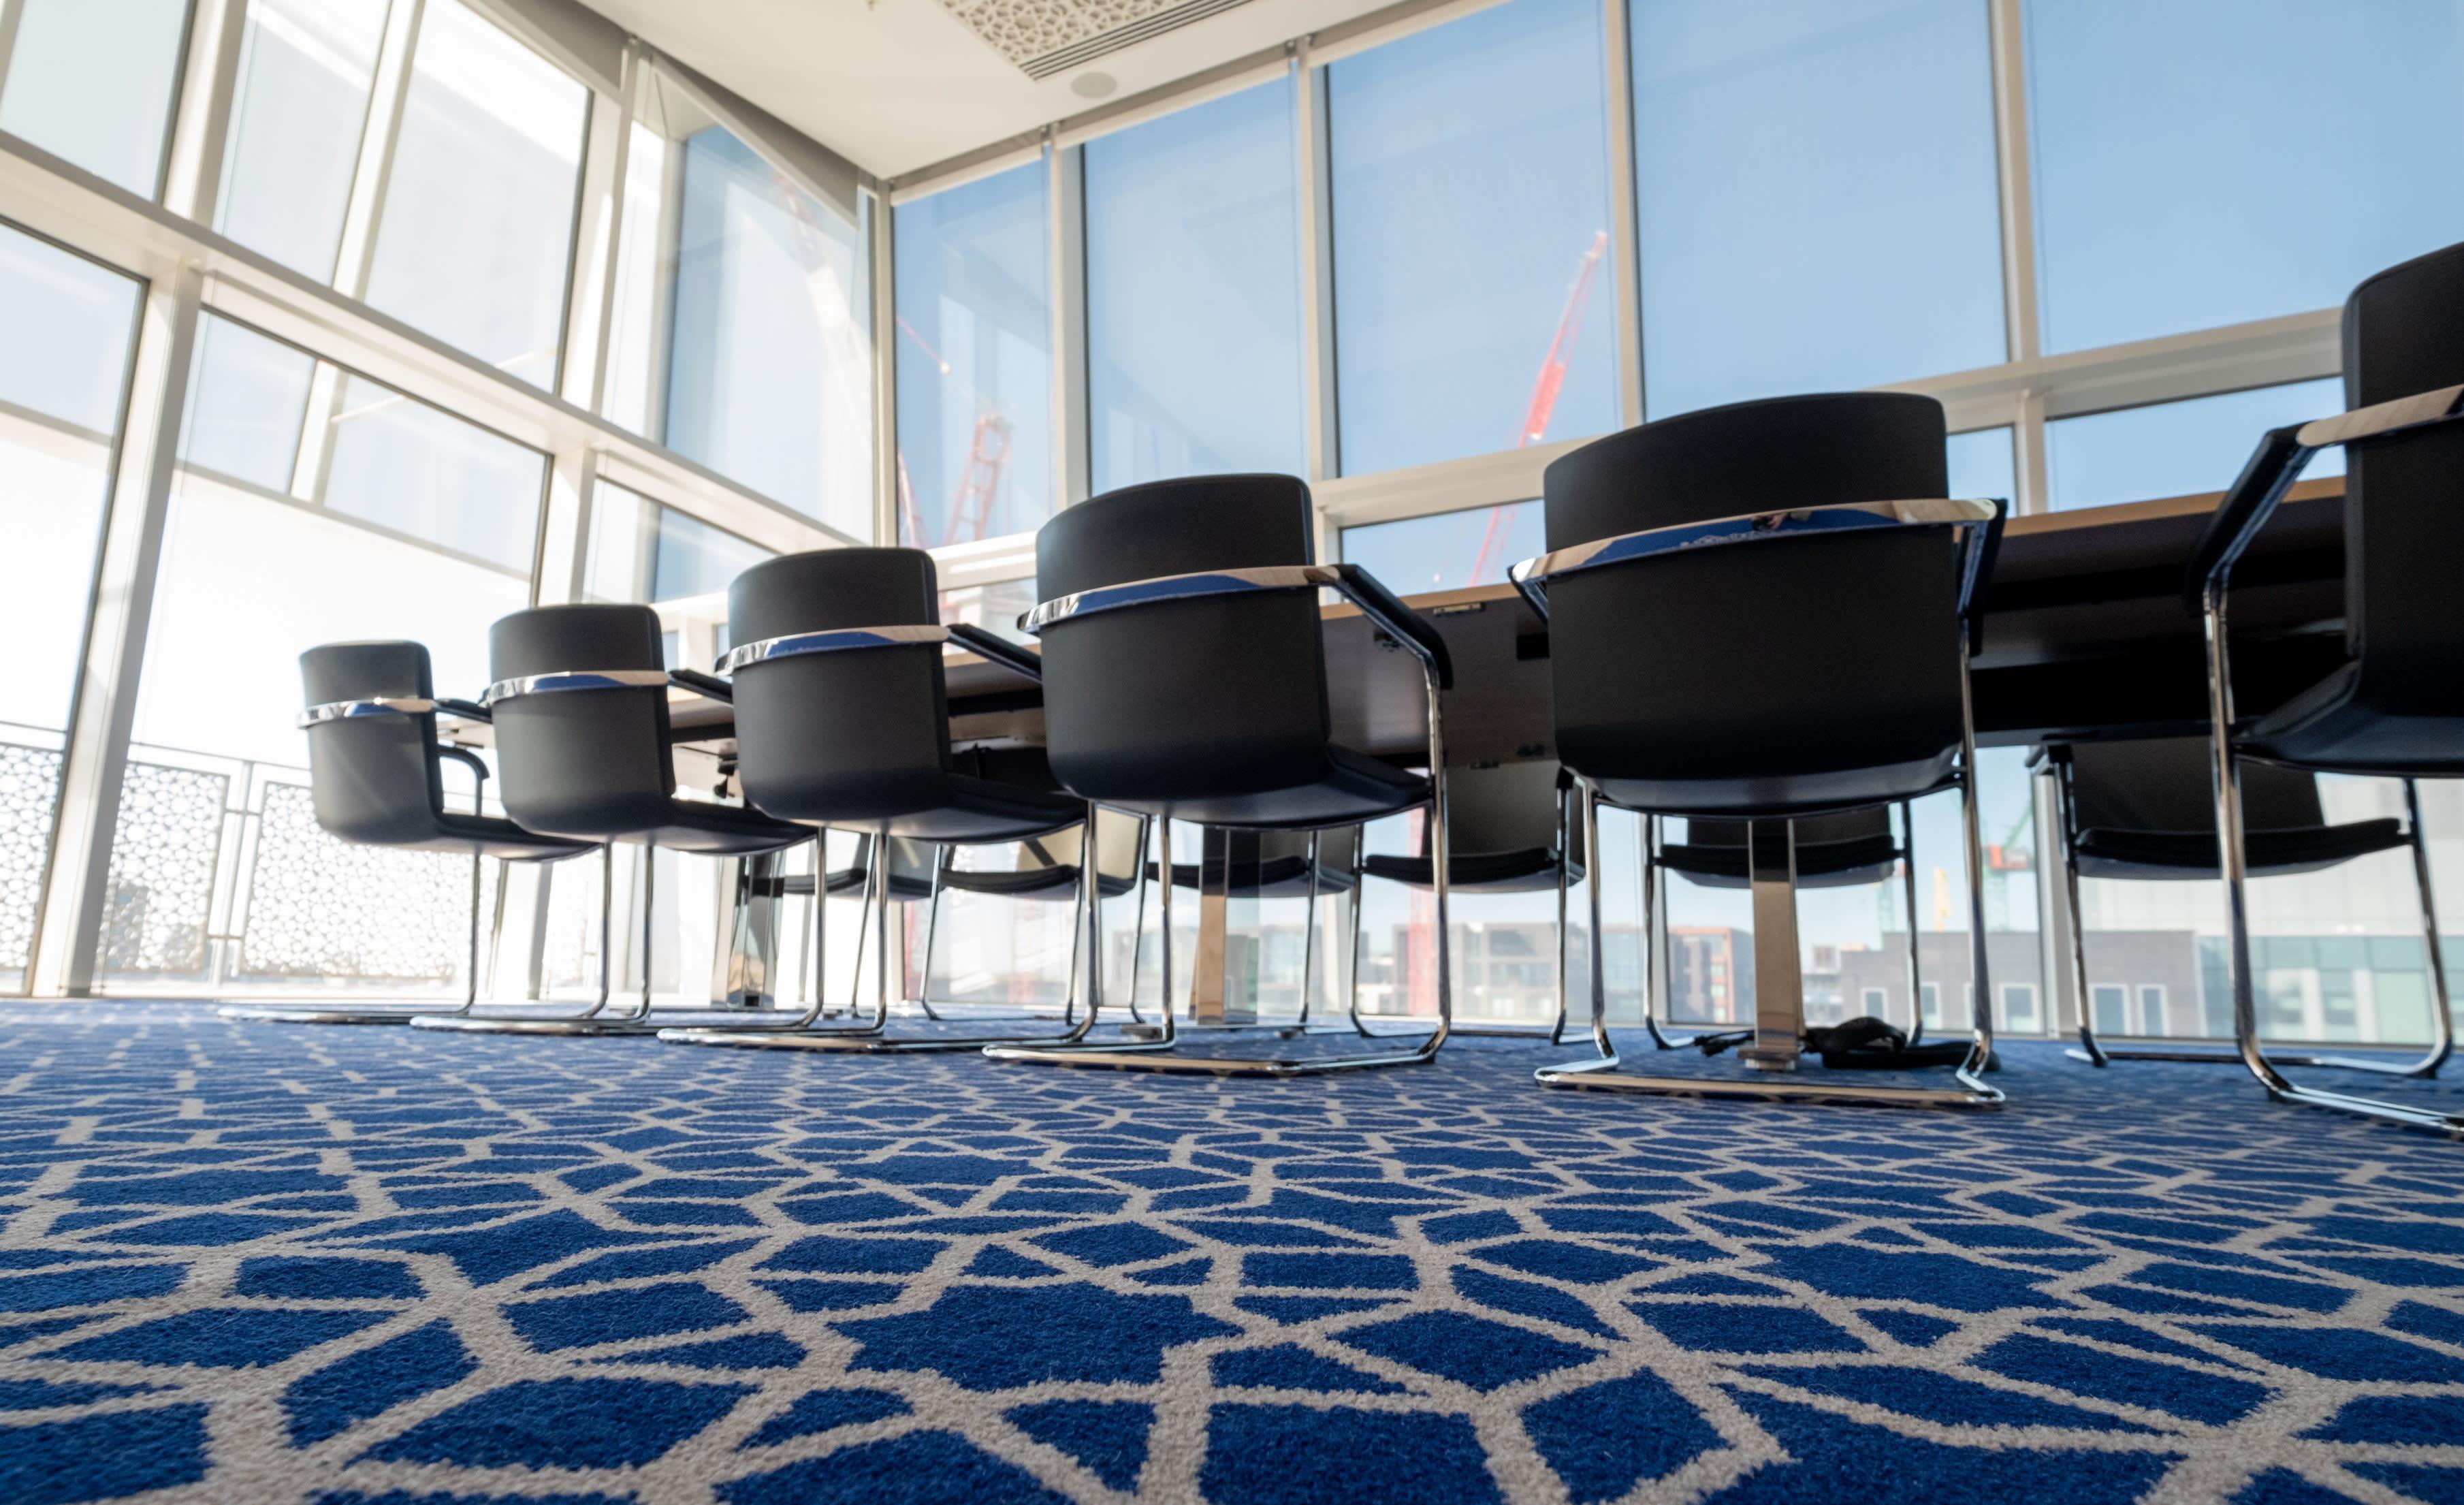 SBG hires proposition director to develop adviser services